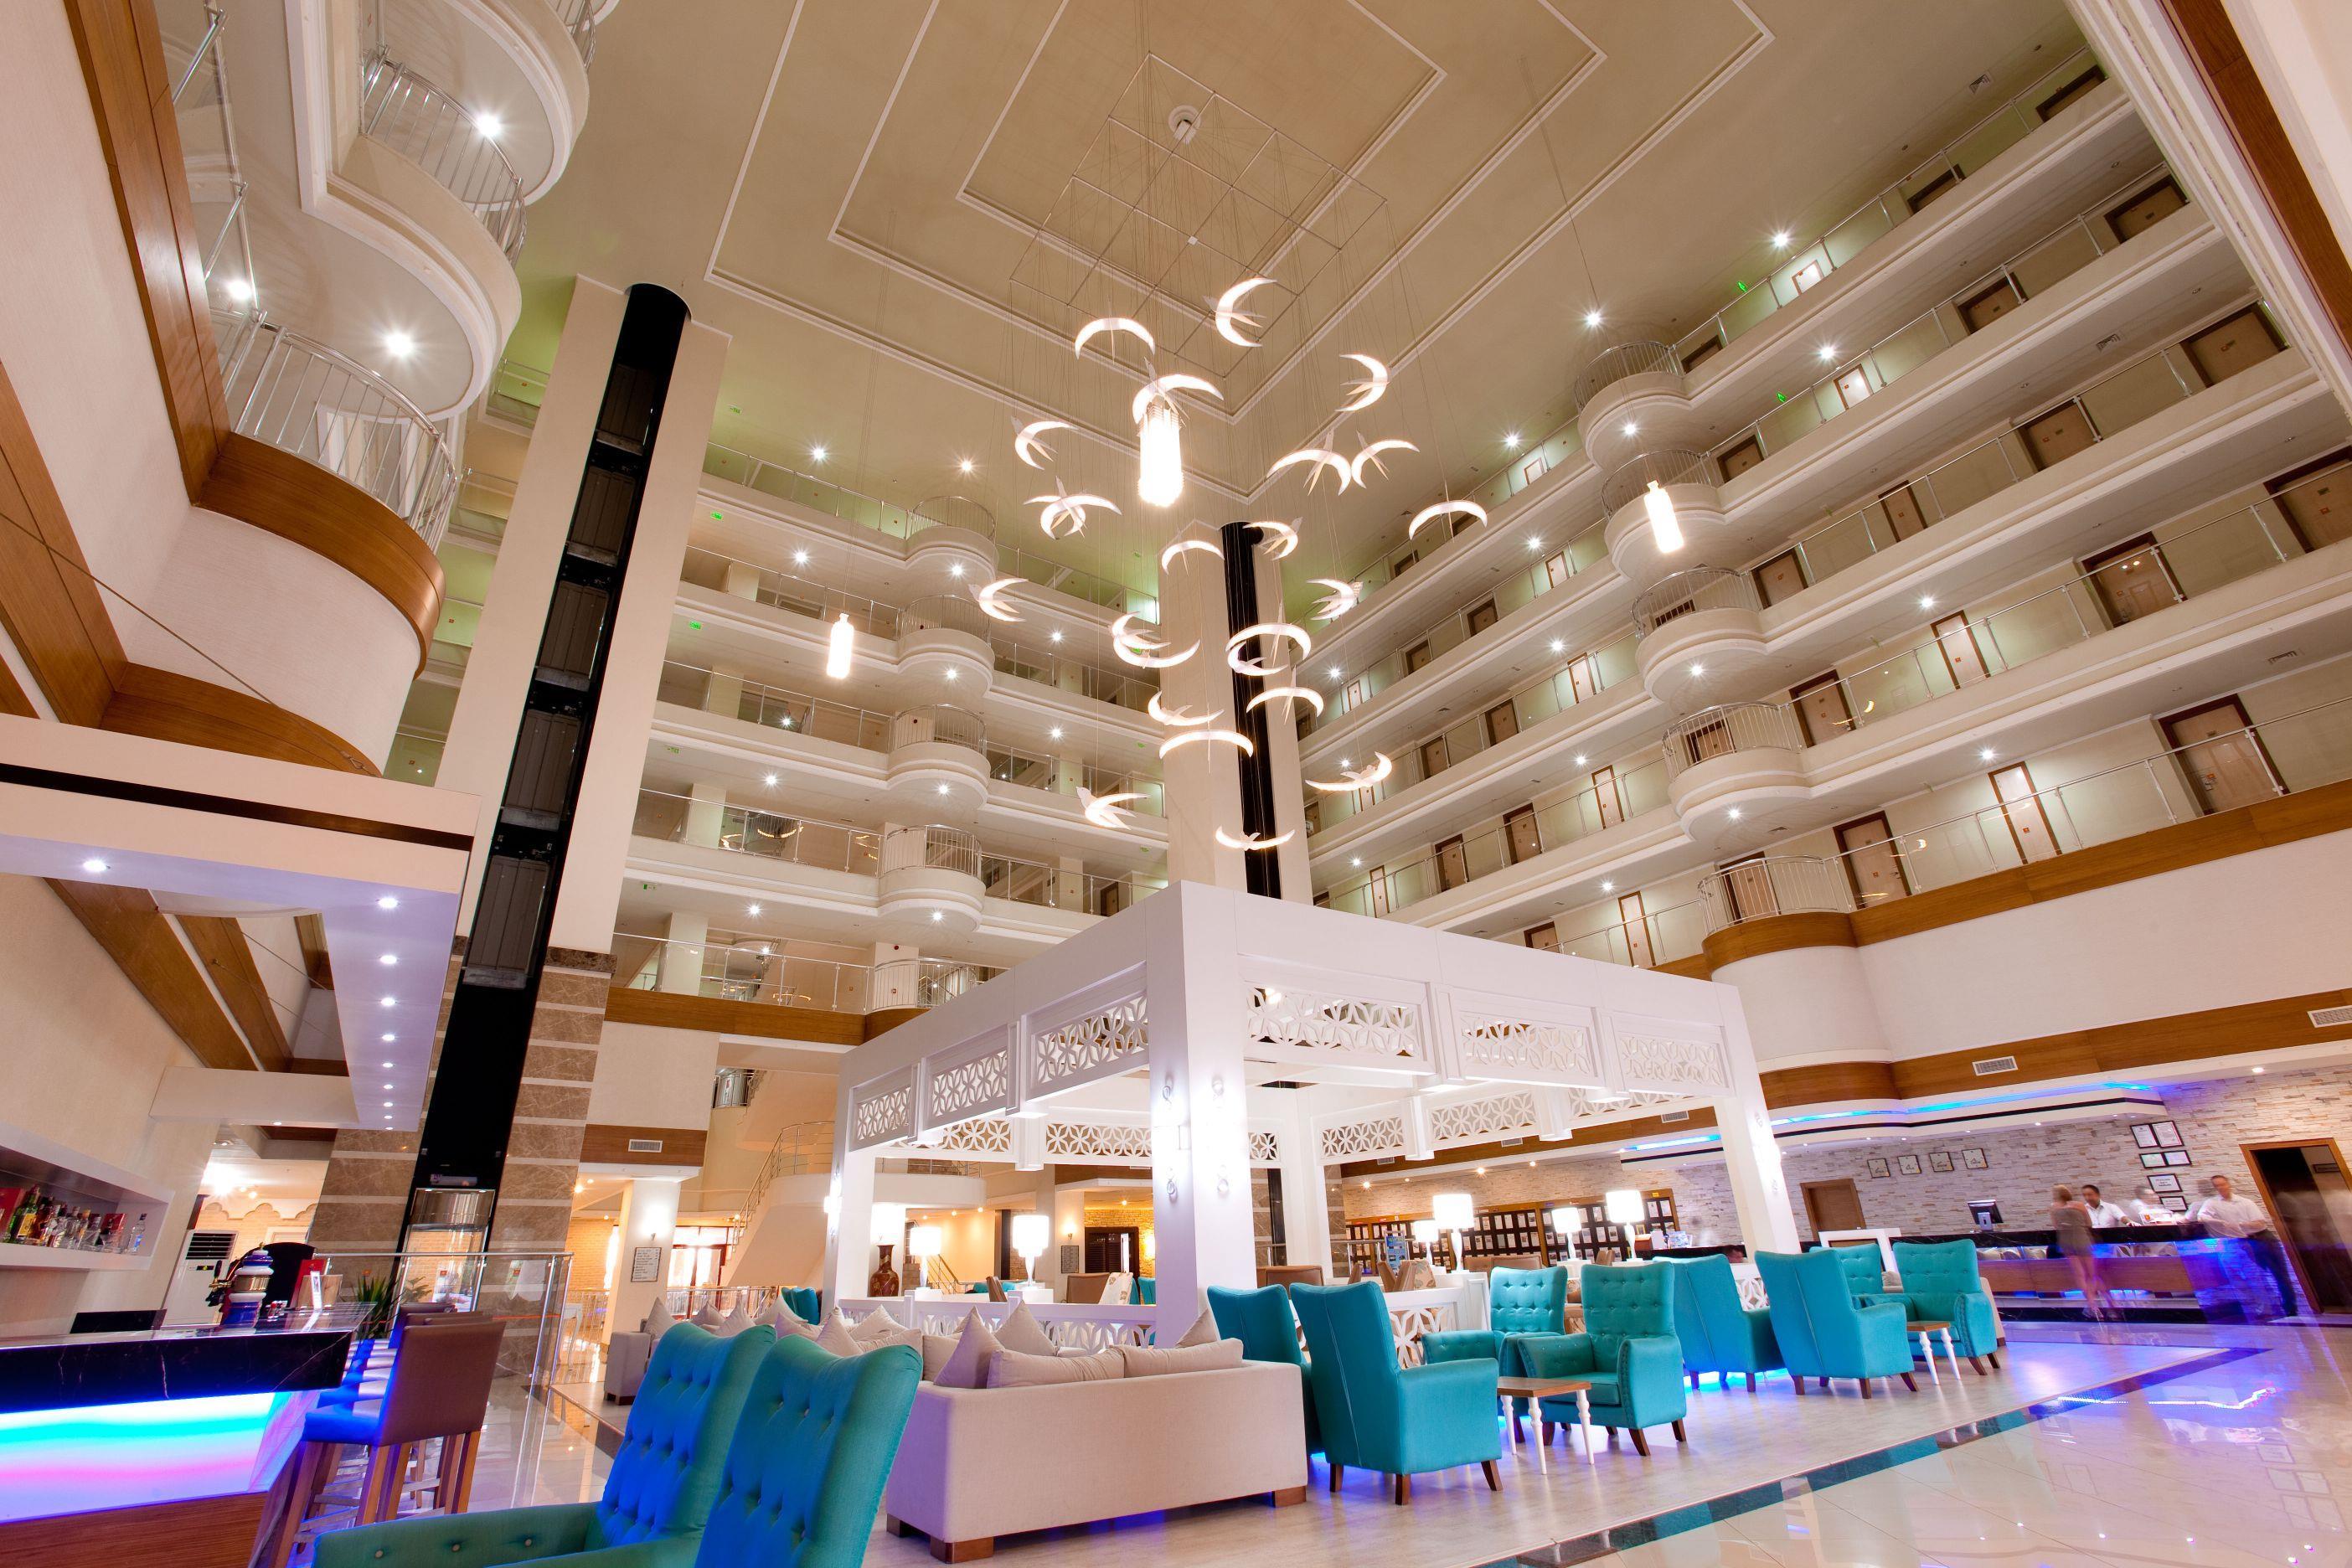 http://www.orextravel.sk/OREX/hotelphotos/stella-beach-hotel-alanya-general-0013.jpg